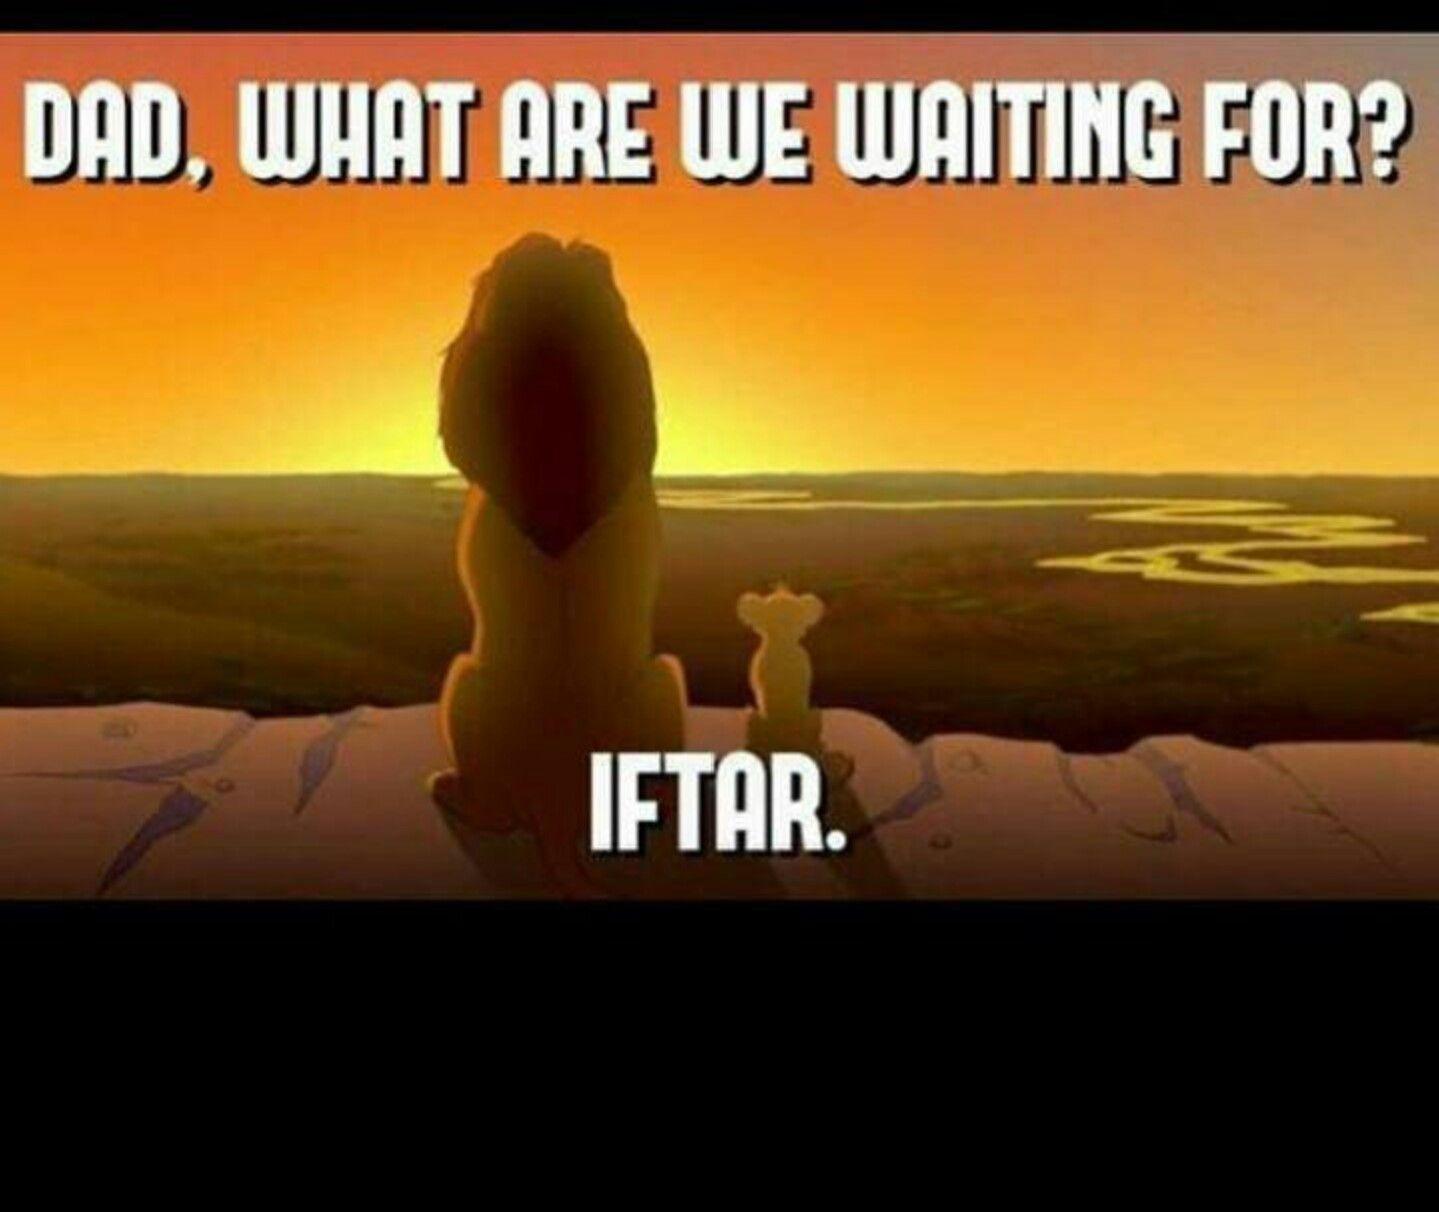 Lol muslim meme muslim quotes arab problems desi problems desi memes